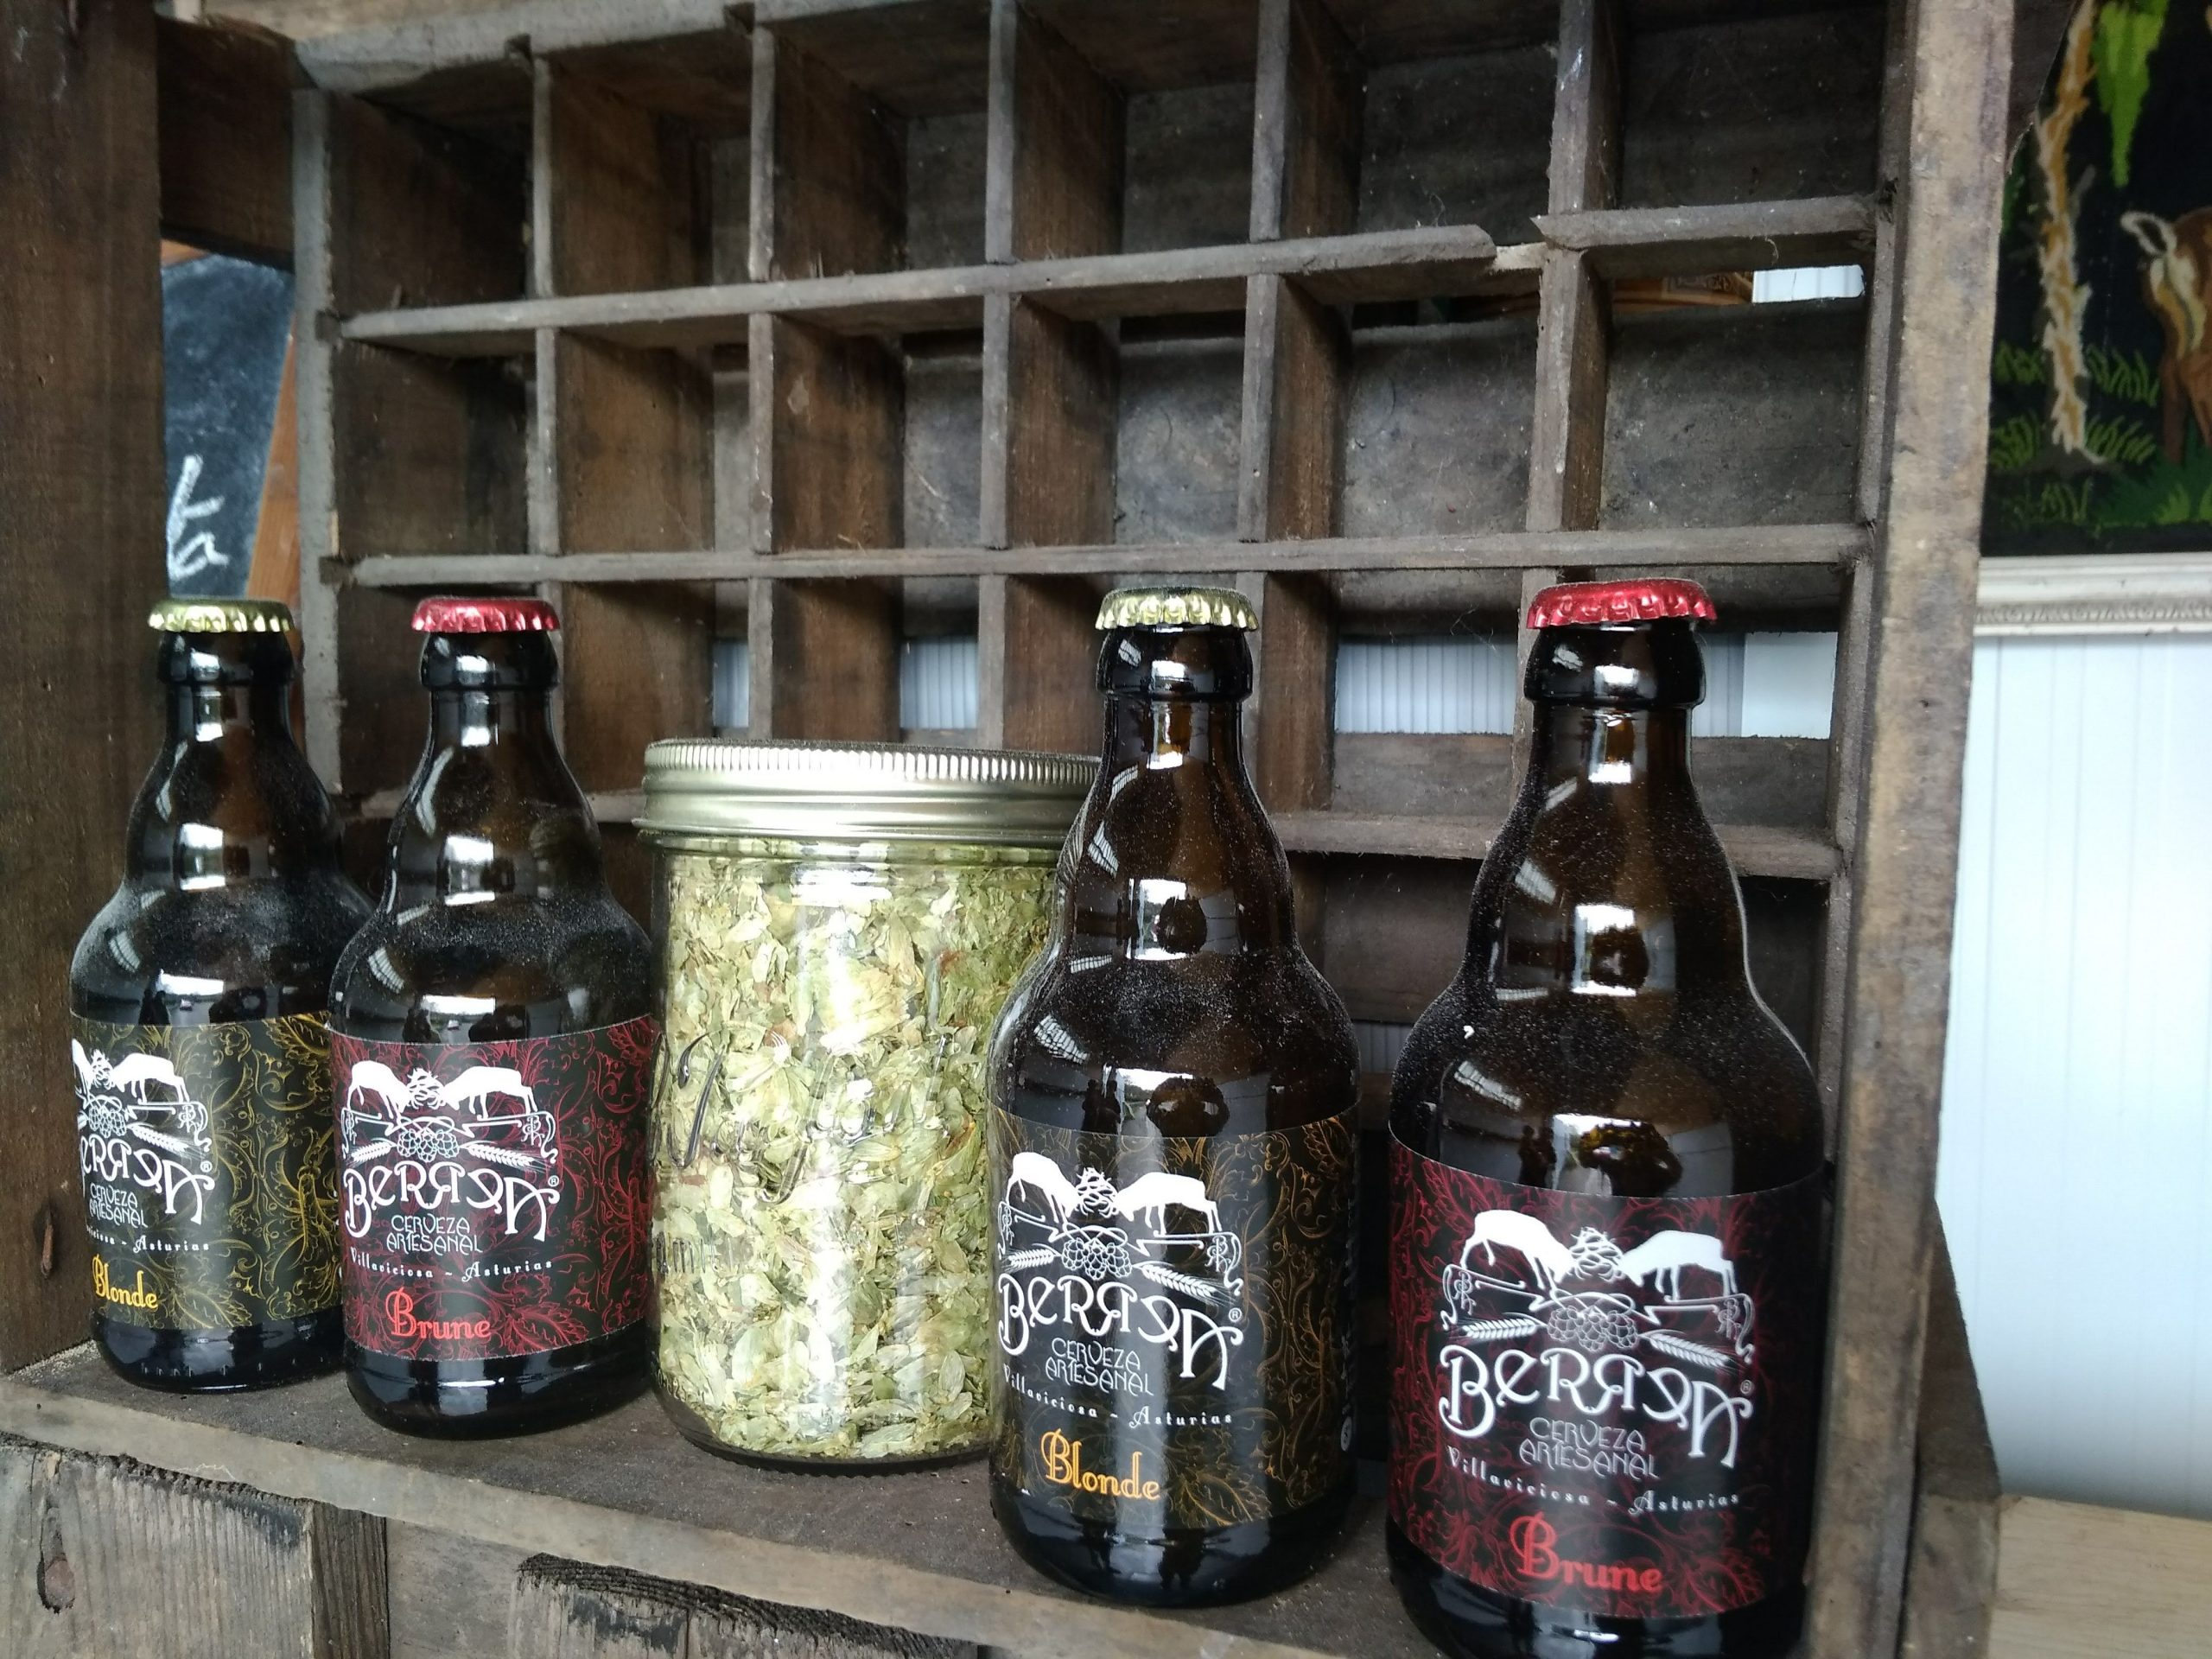 Visita a la fabrica de cerveza artesanal Berrea, en Asturias.